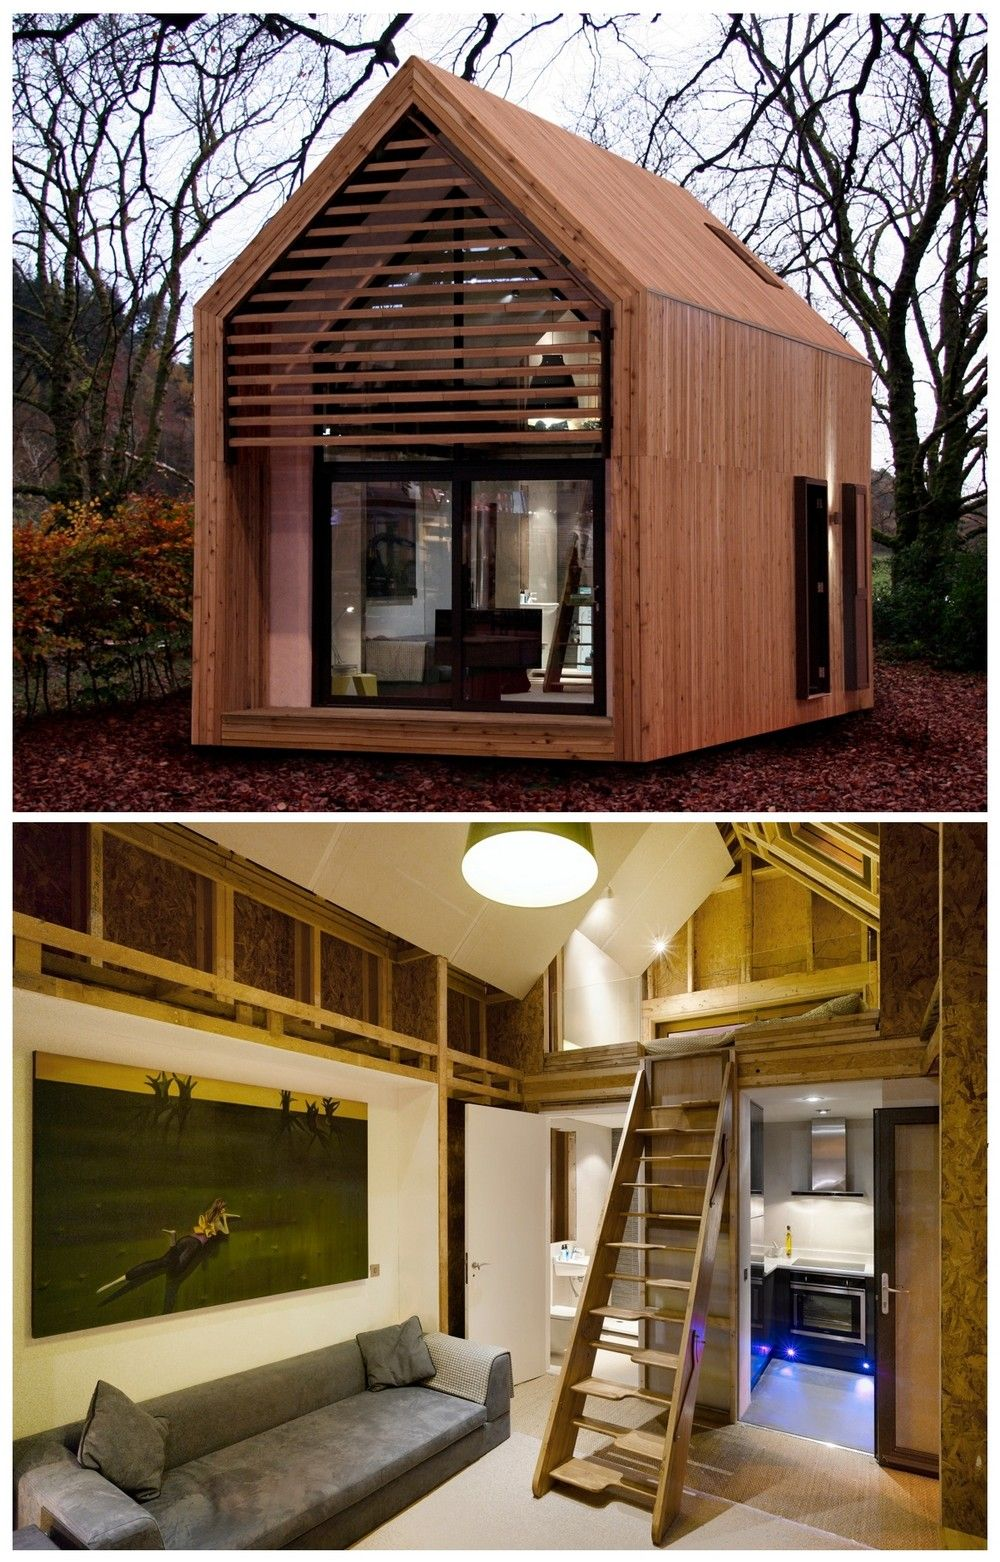 Dwelle Minimalist House Prefabs Home Sweet Home